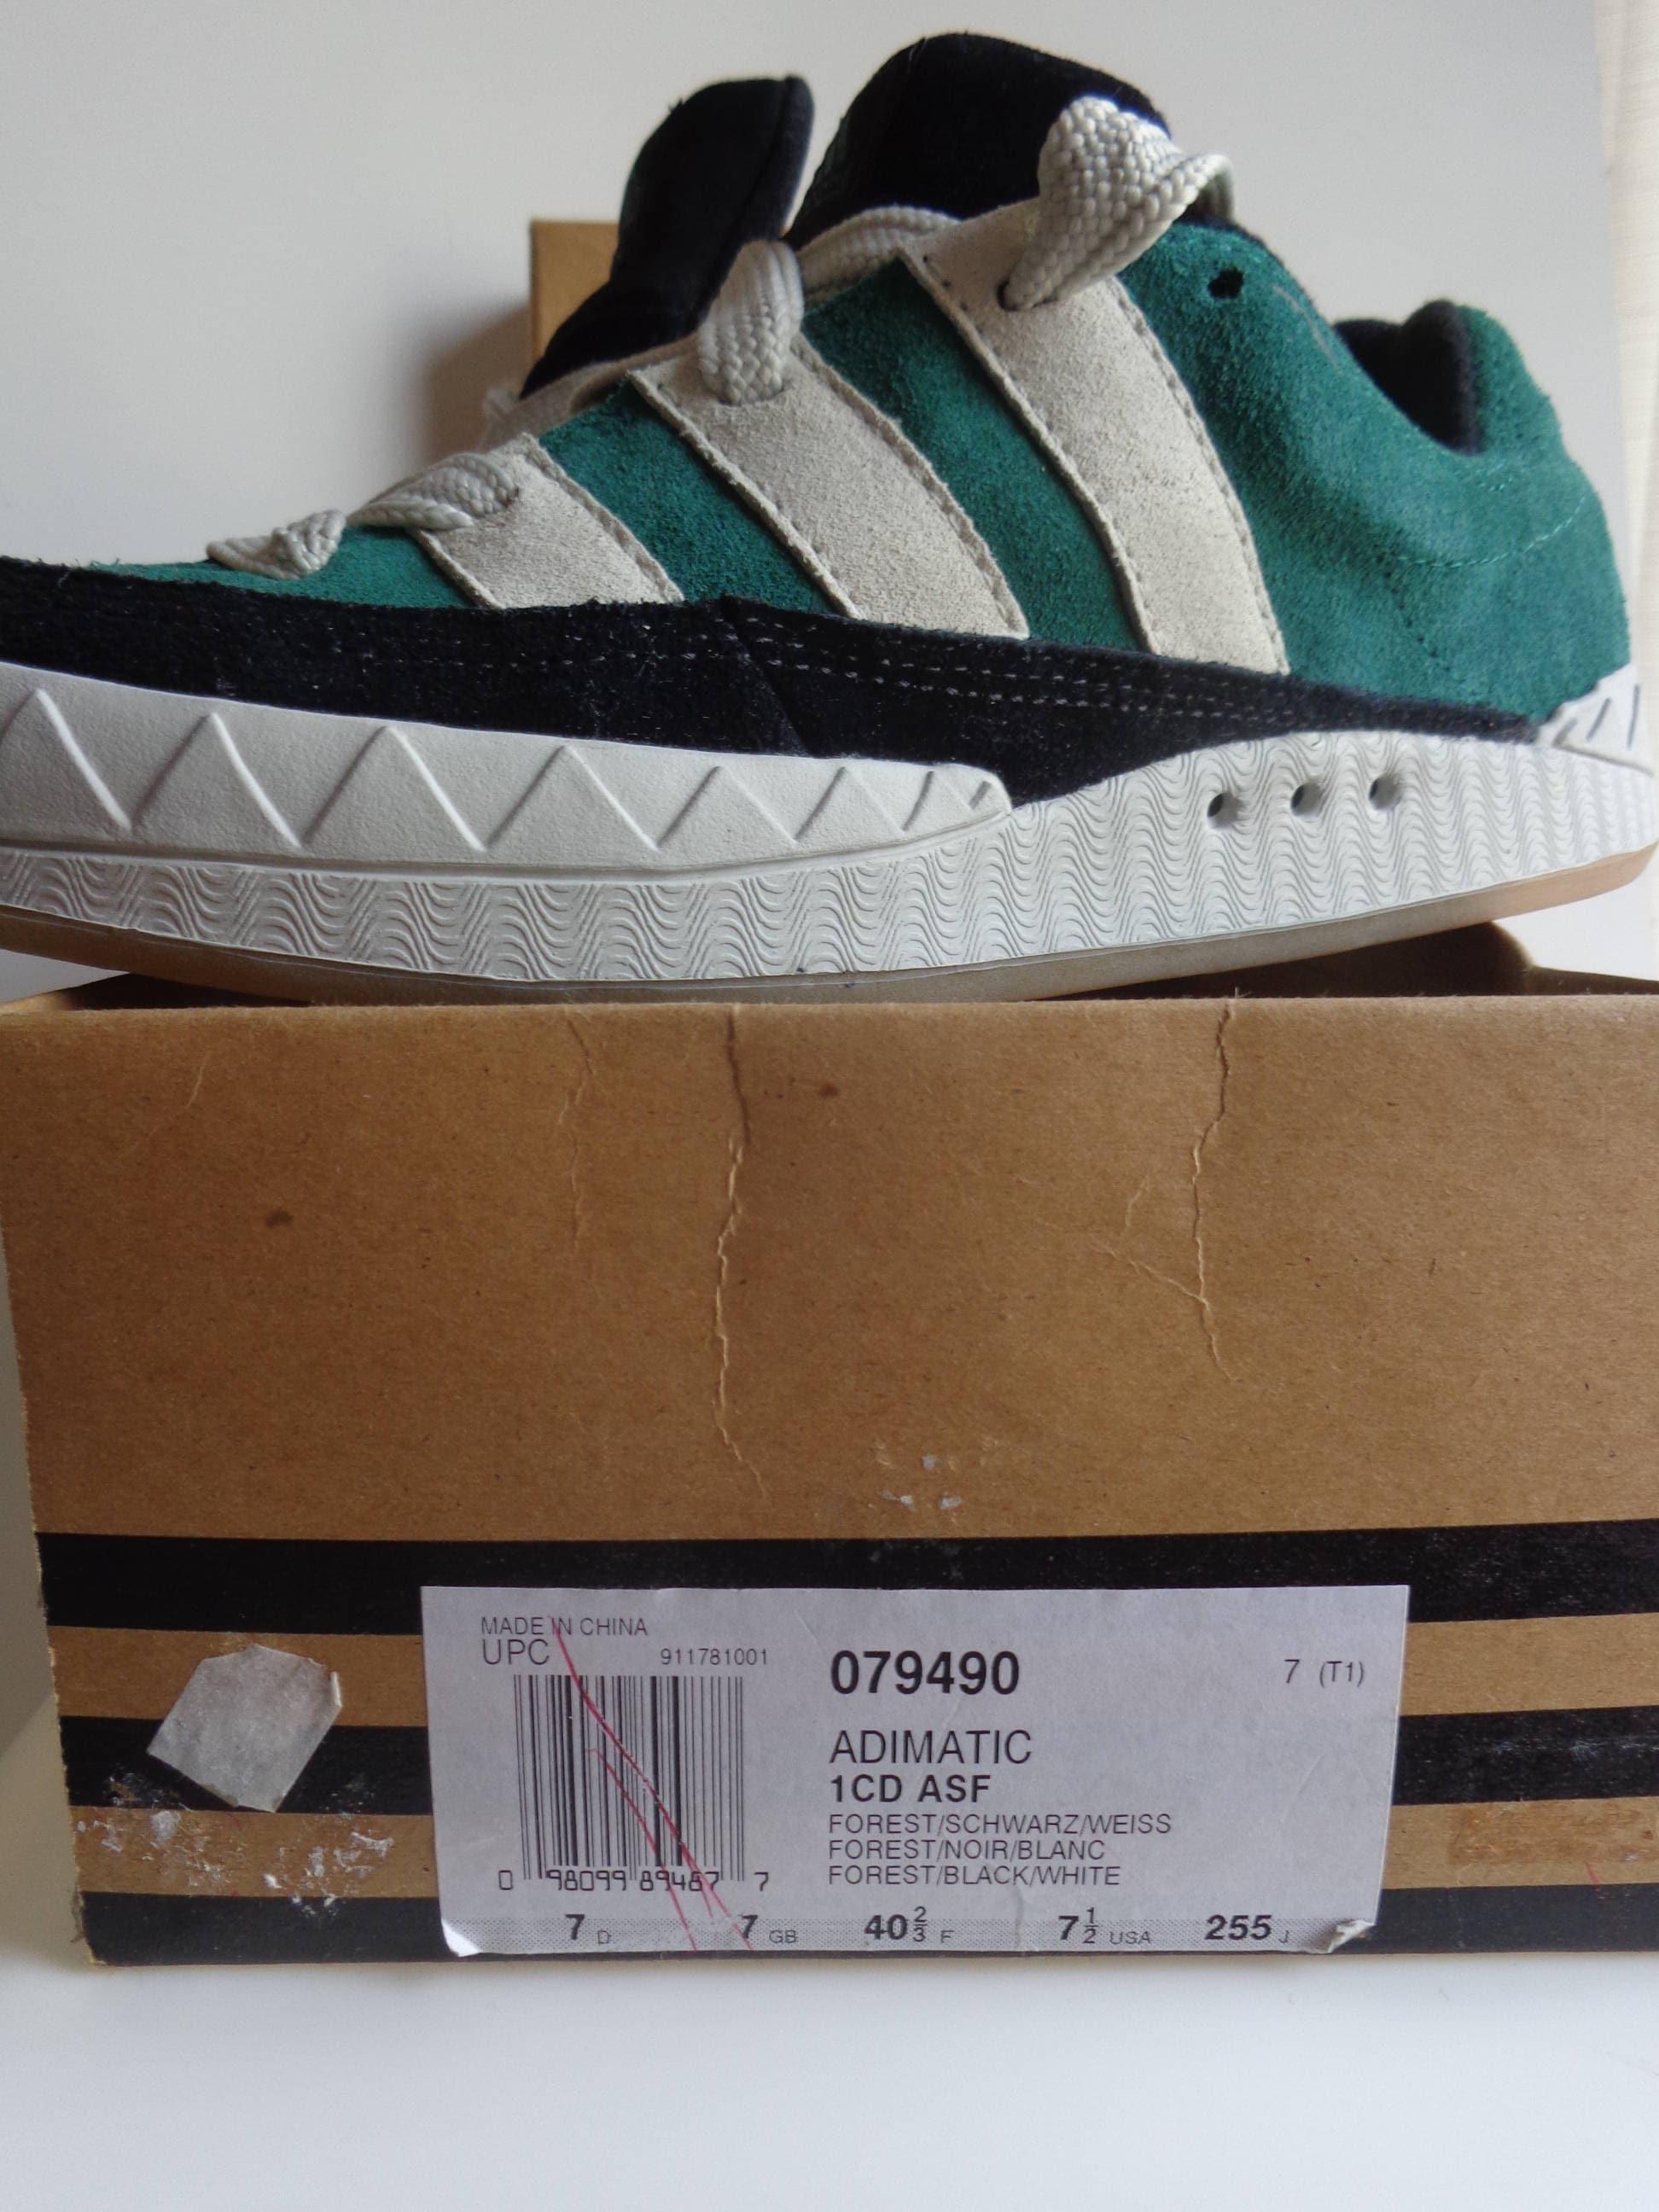 Chaussures 90 Adimatic Vert 079490 S Adidas Vintage xIqZwUI8